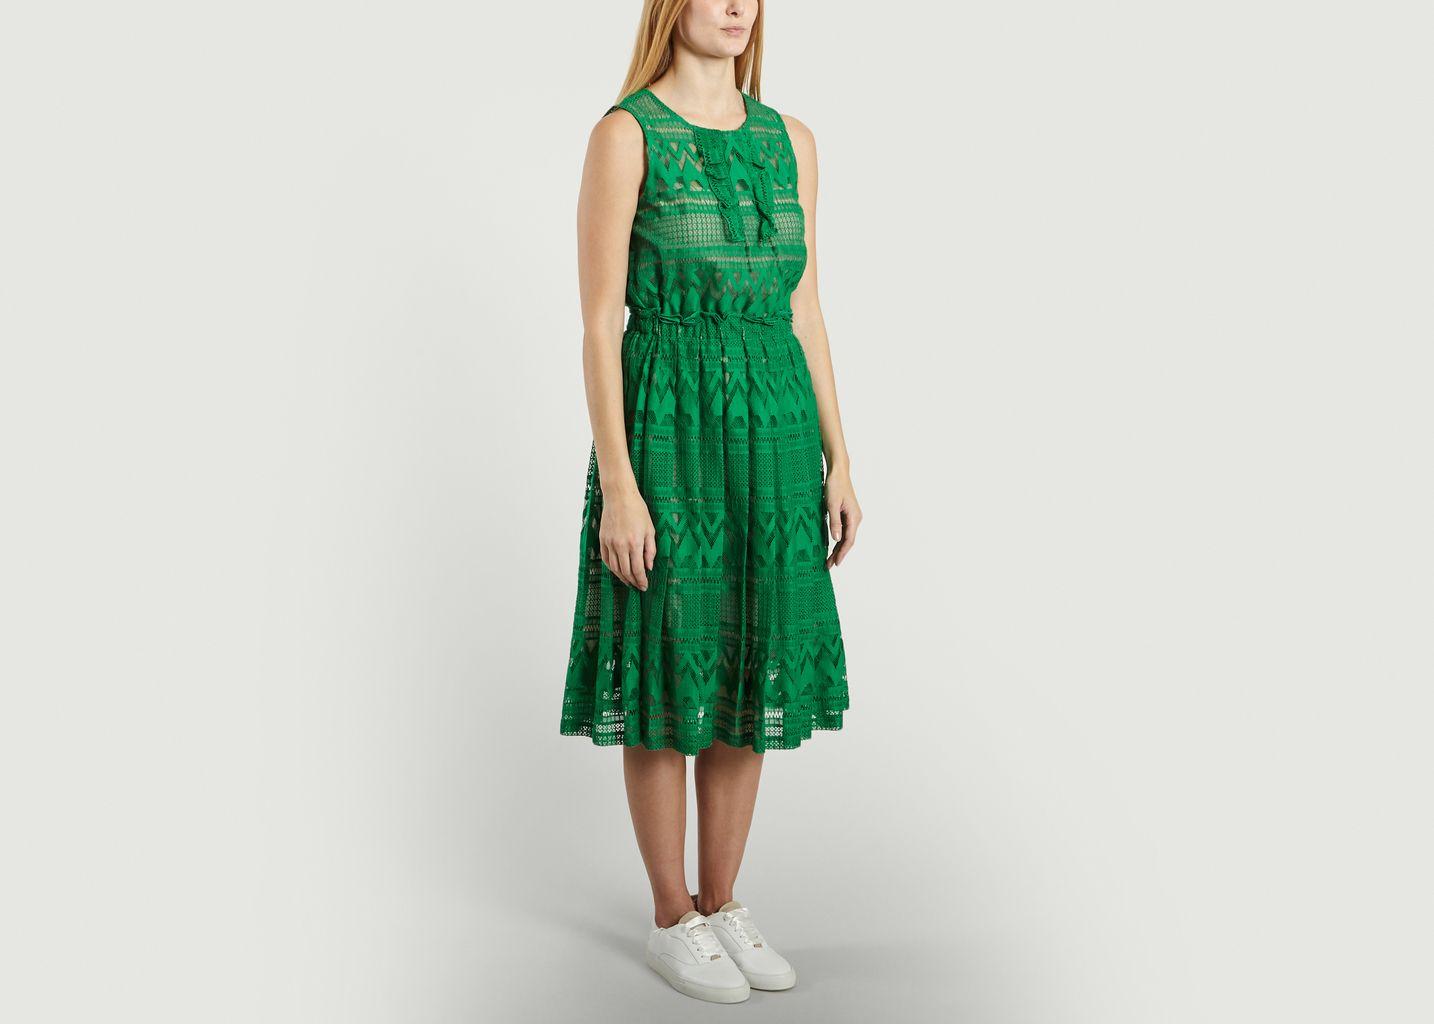 d1a699fc86dd Roselinda Dress GreenAttic and Barn